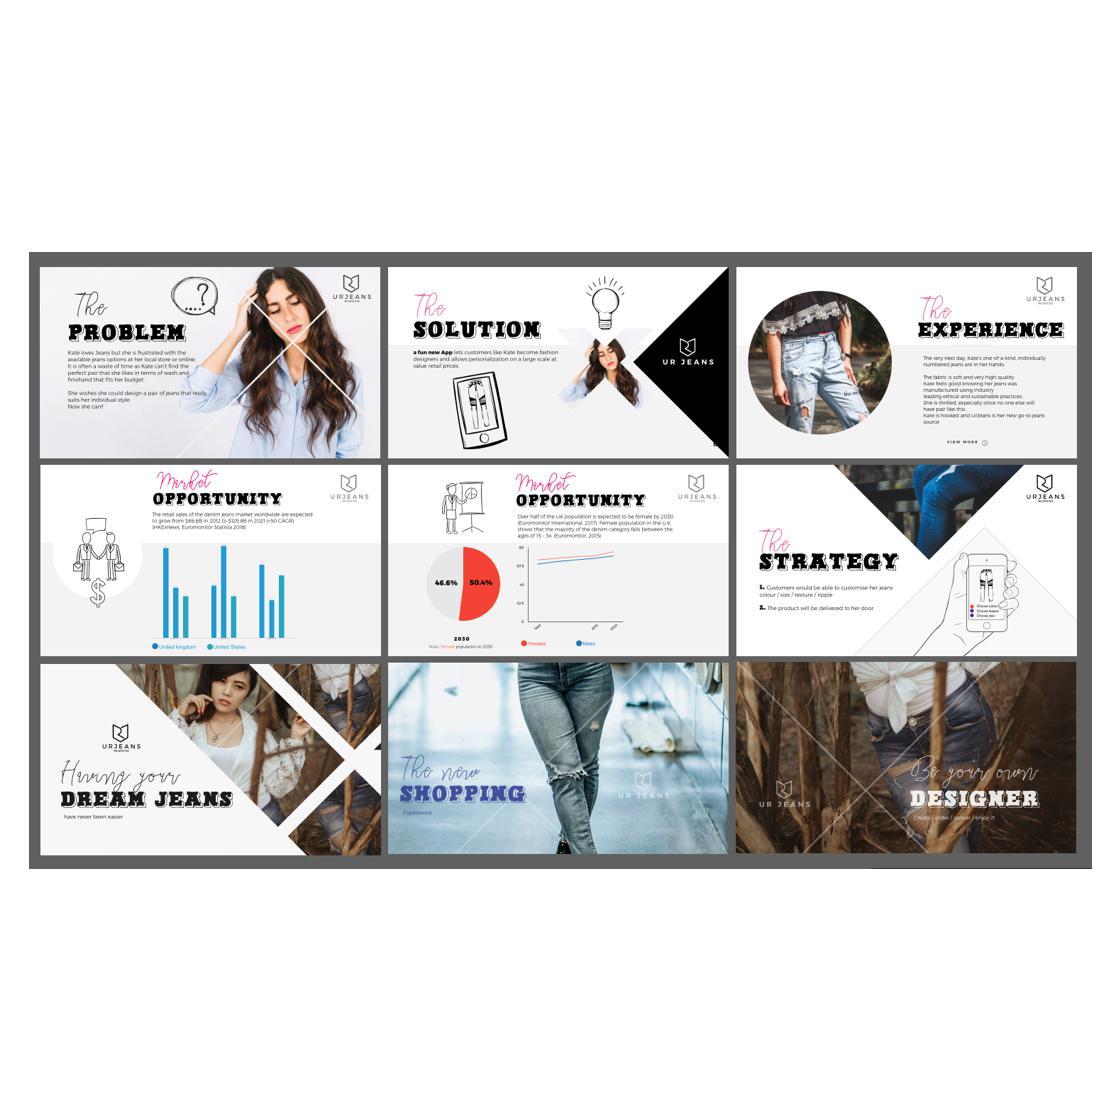 presentation designed by schk